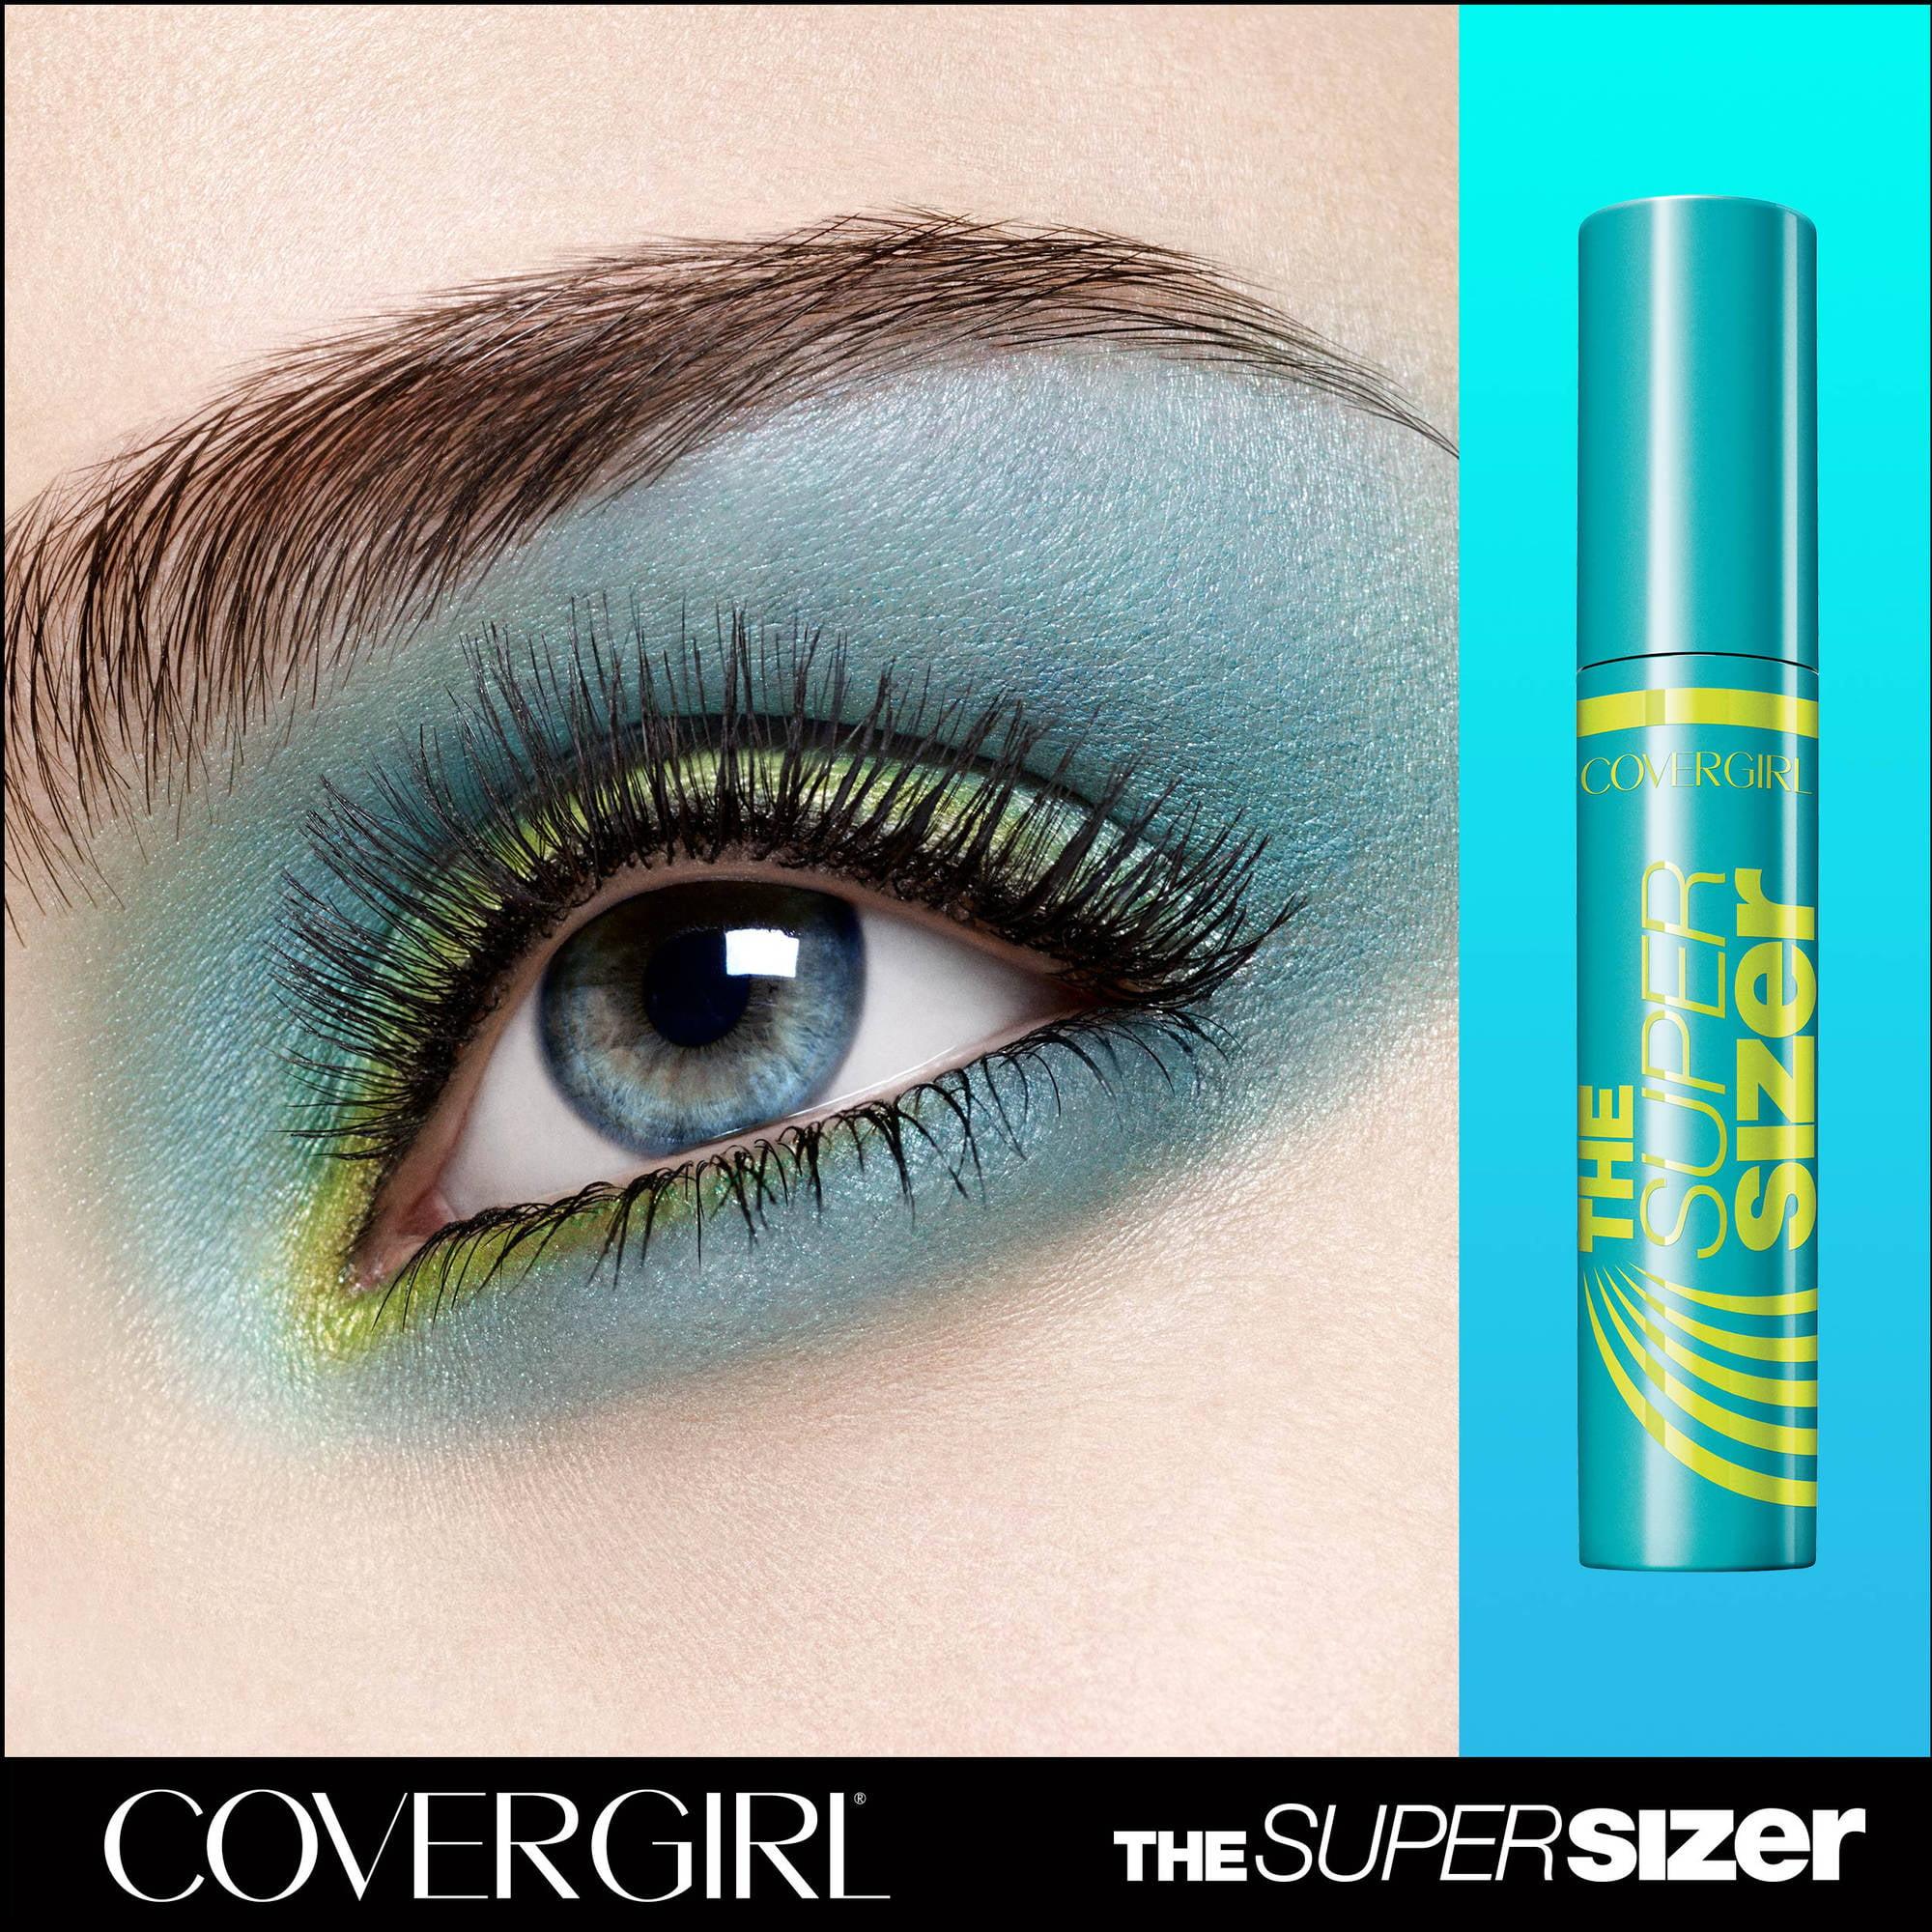 eea9351d398 COVERGIRL Super Sizer Mascara, 800 Very Black - Walmart.com